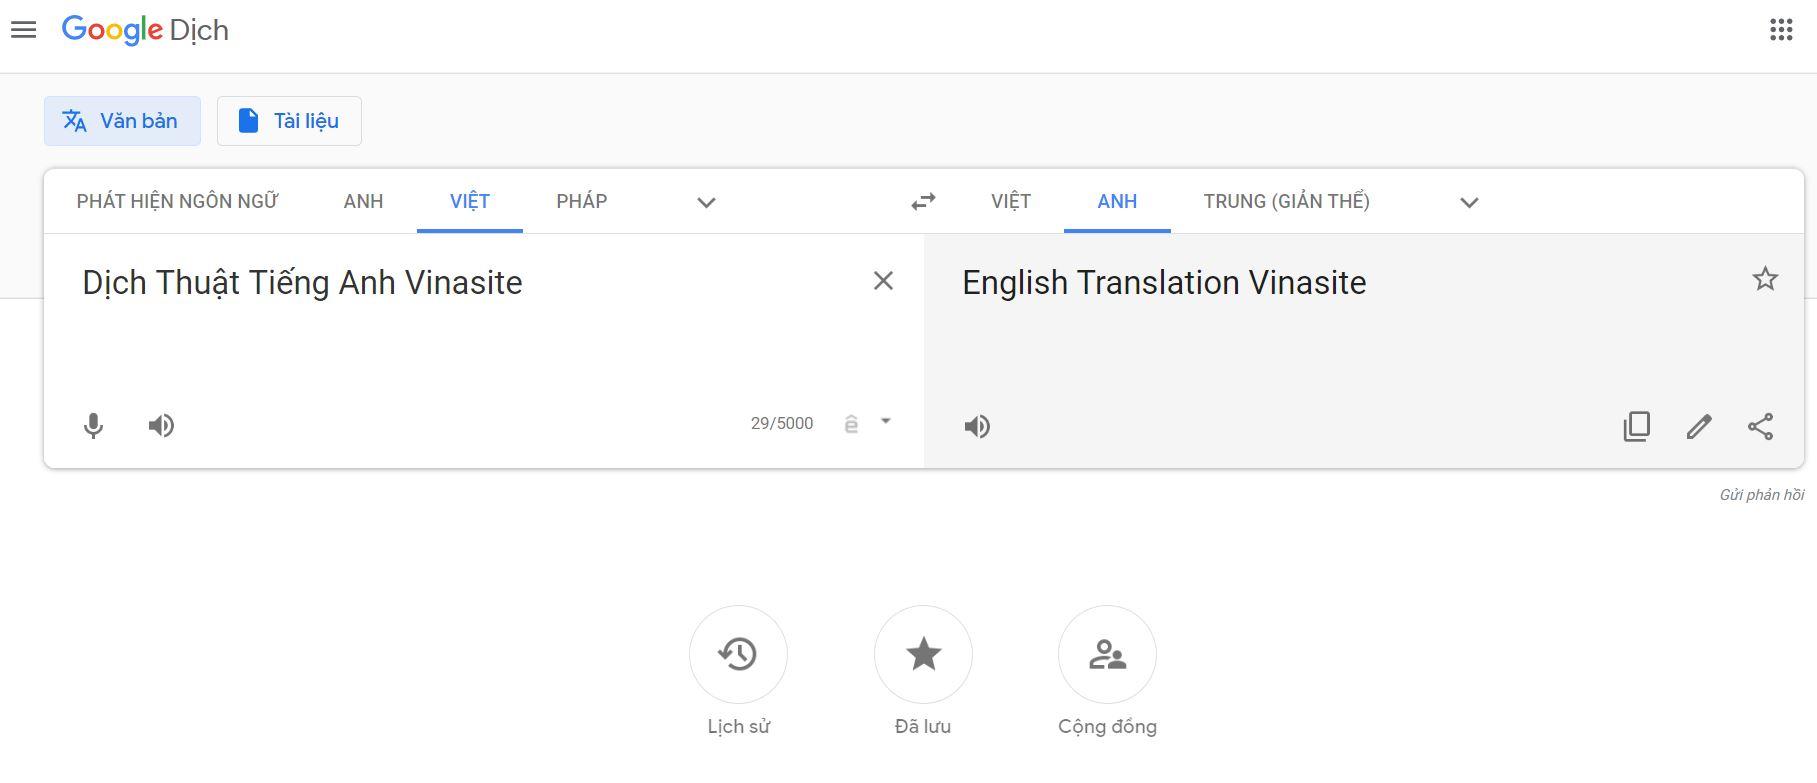 Phần mềm dịch thuật online Google Translate